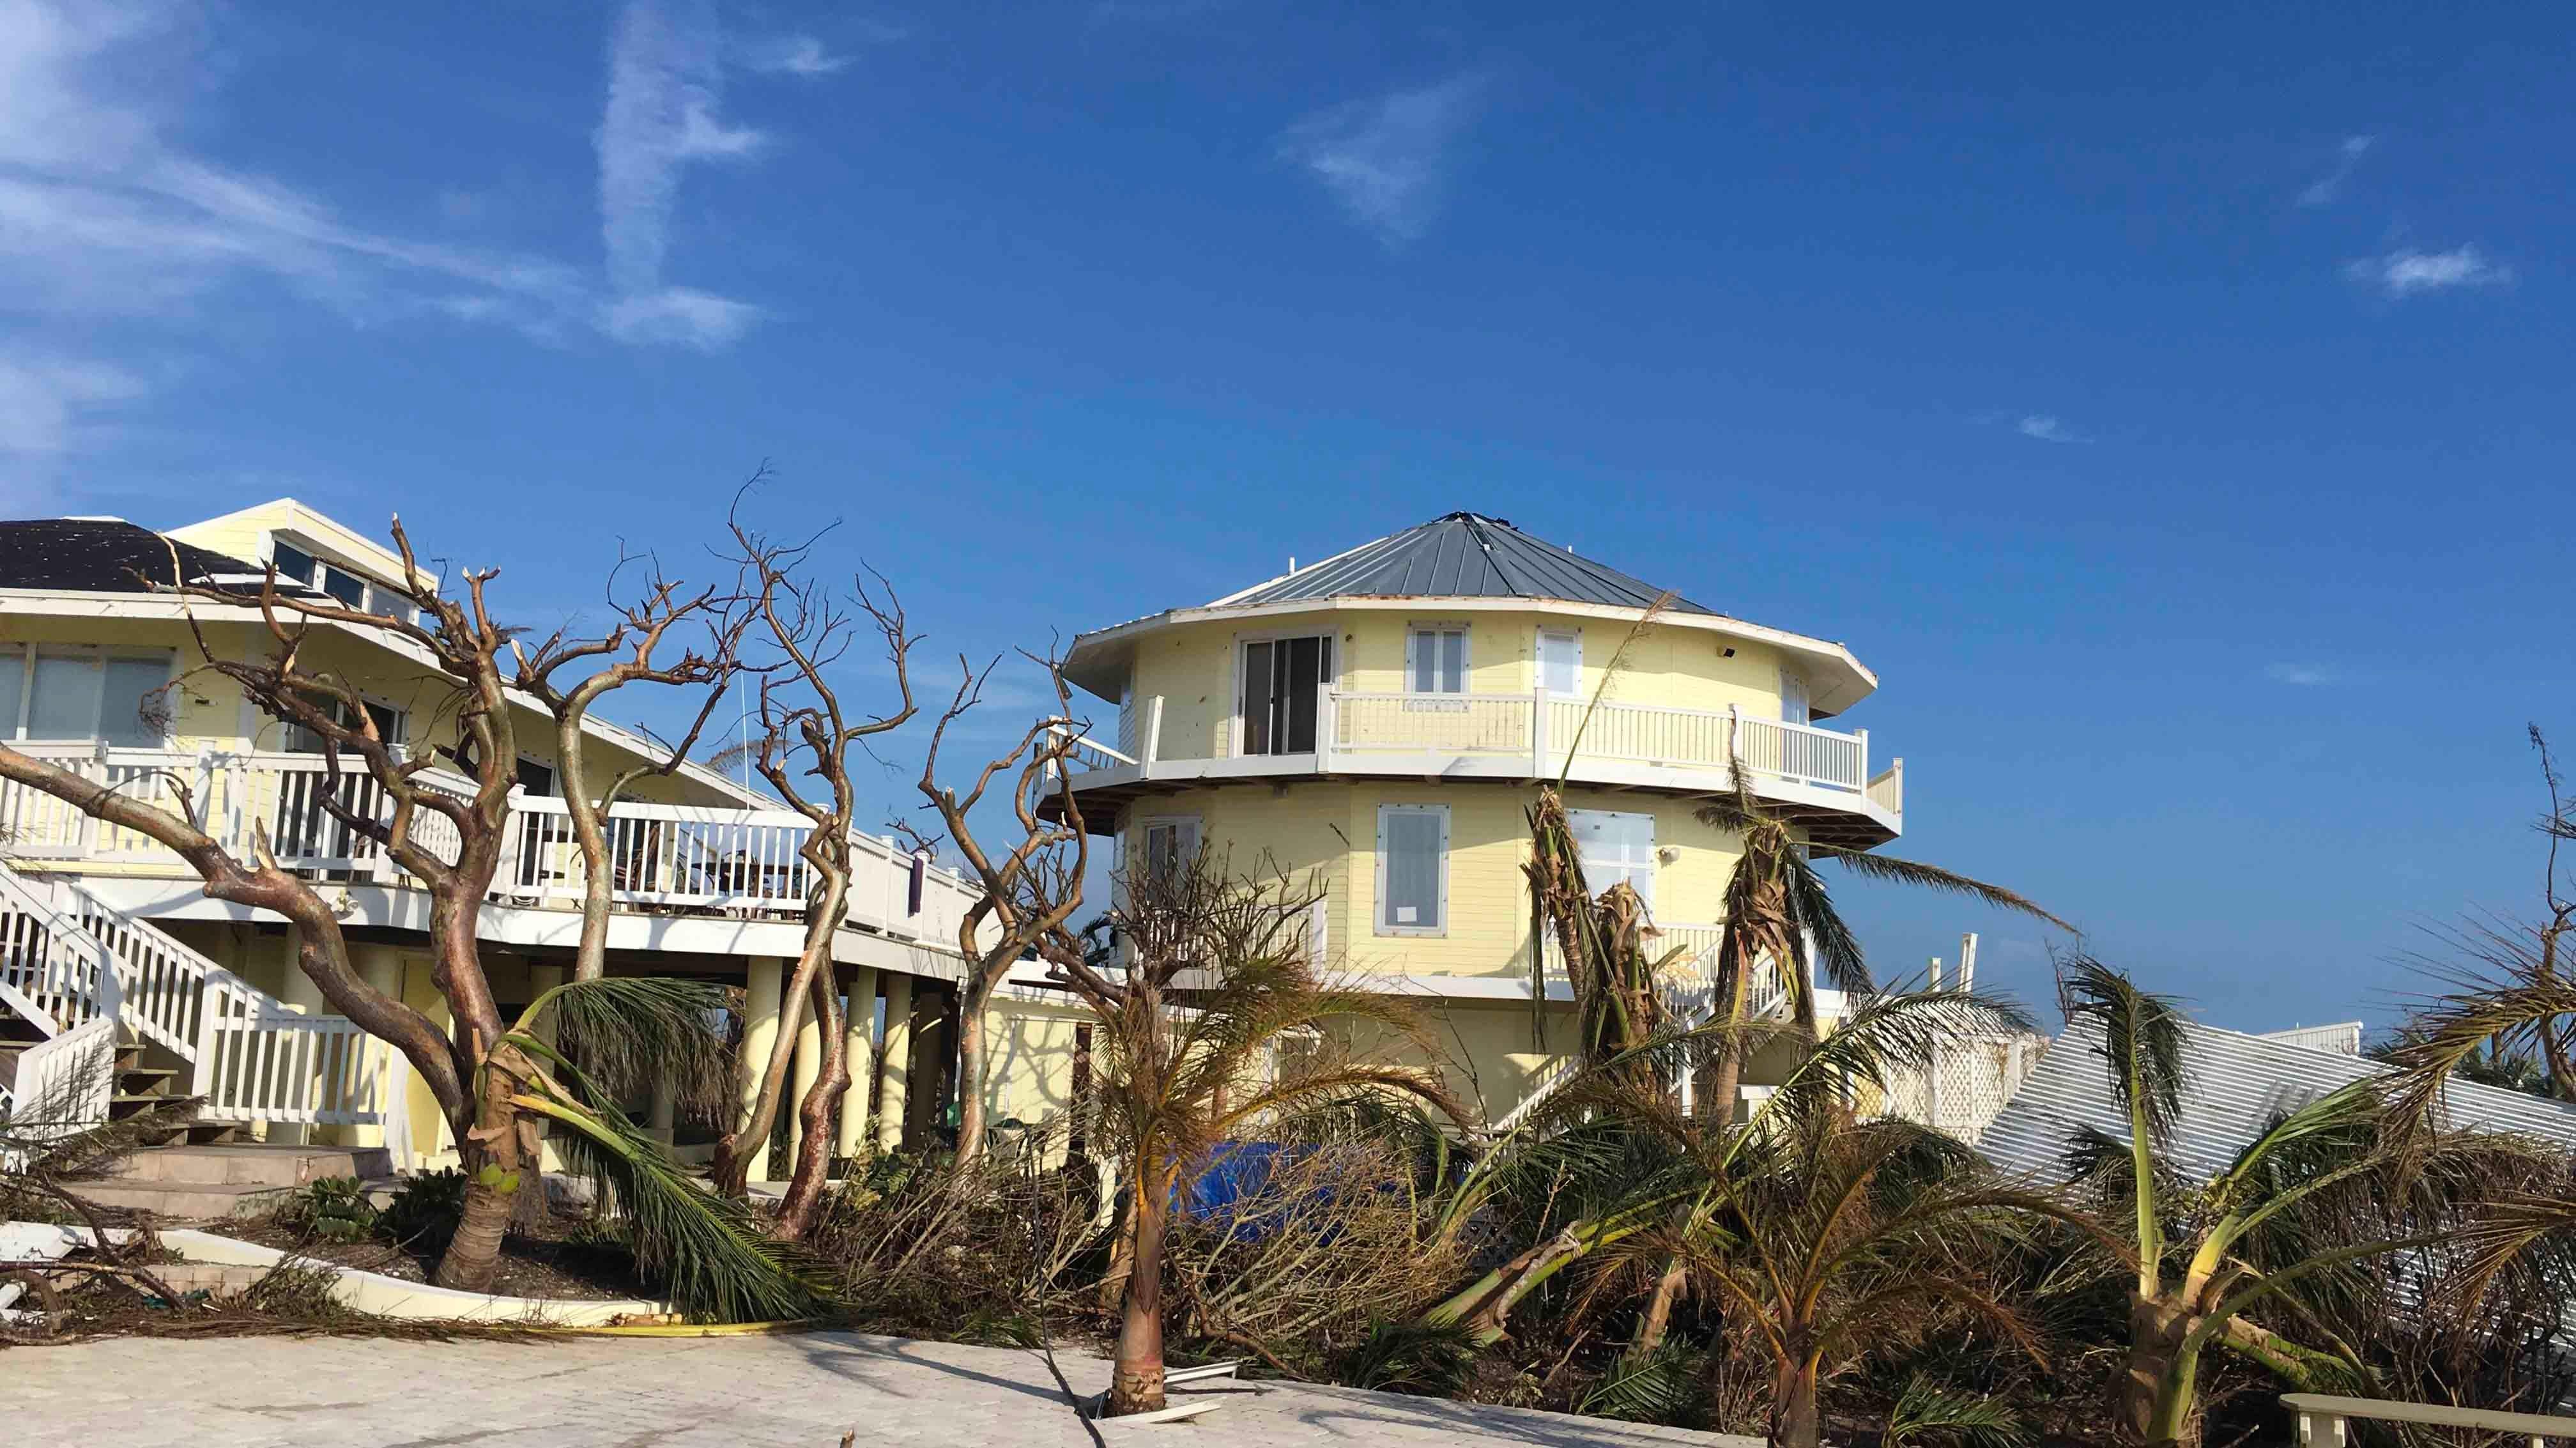 How Does a Home Survive Amid the Devastation of A Major Hurricane like Dorian?